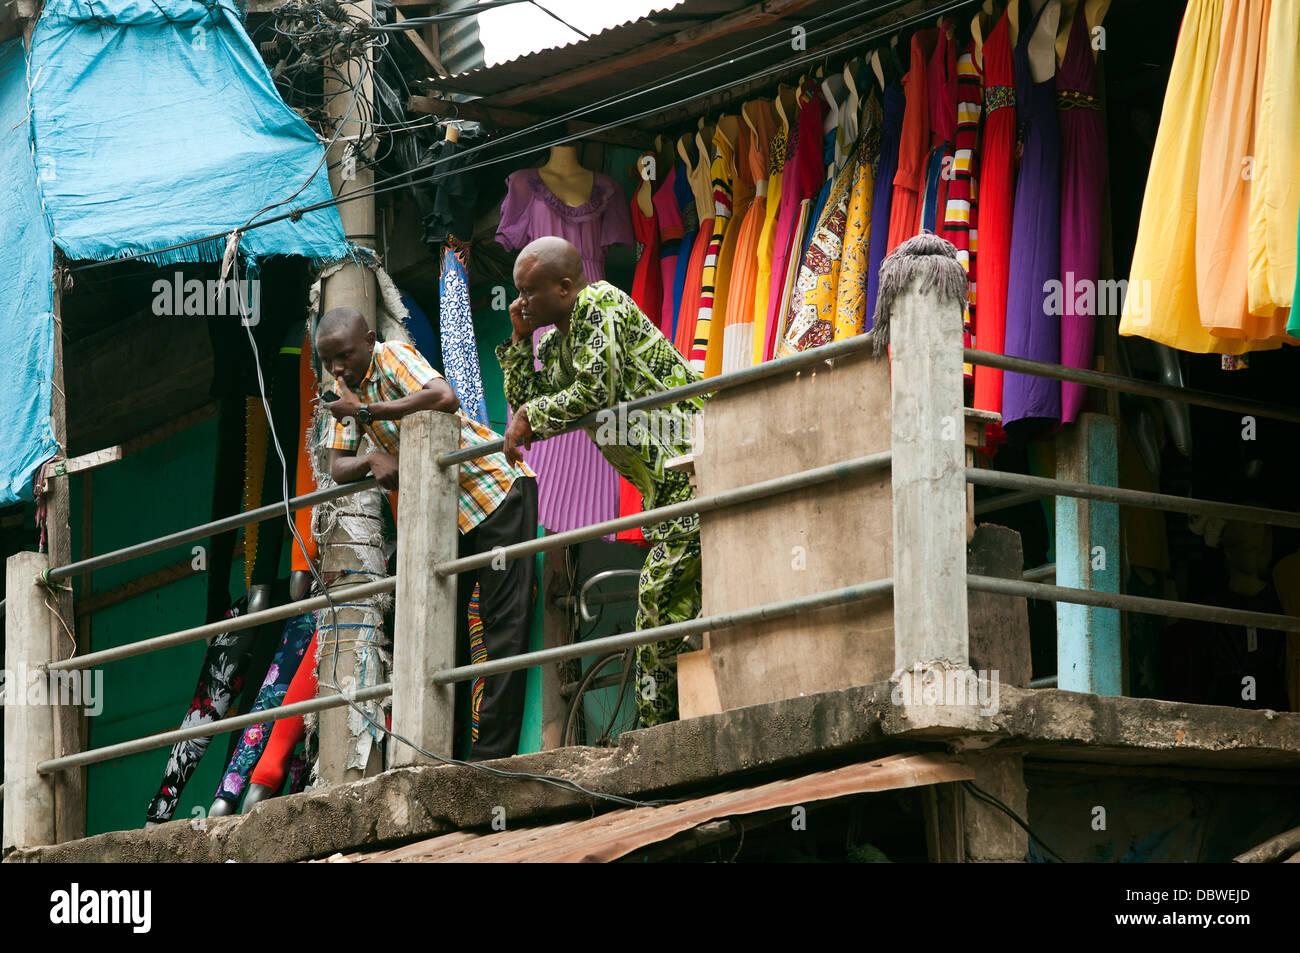 street scene, Lome, Togo - Stock Image